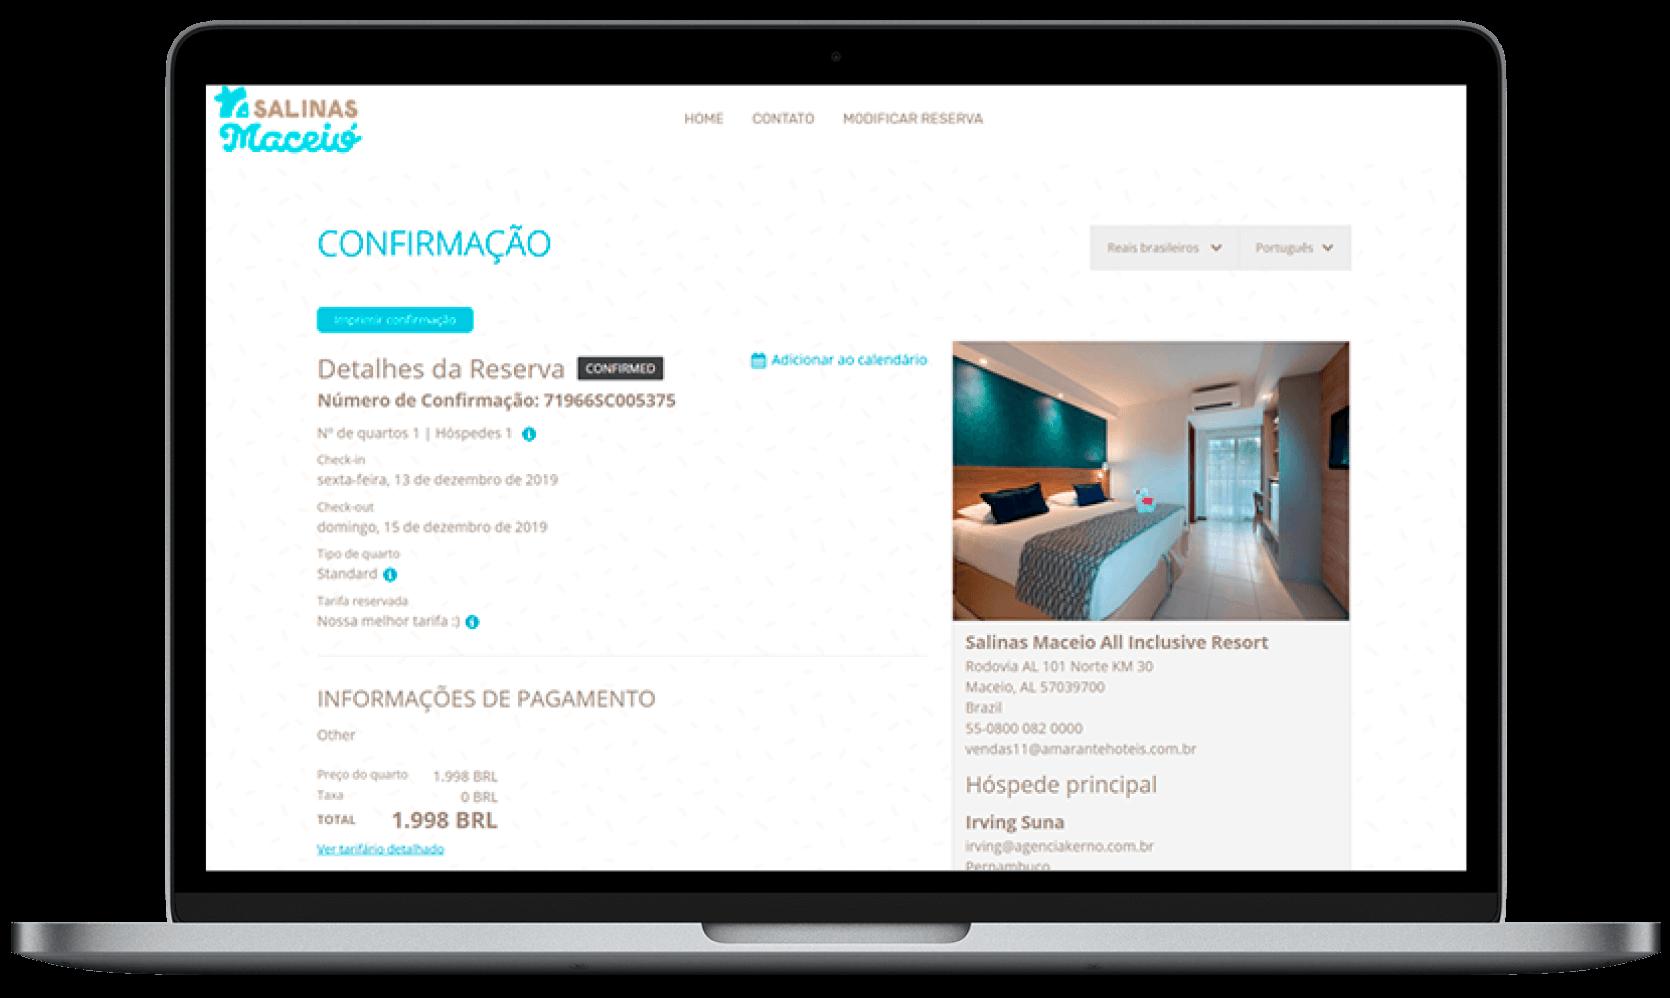 Faça sua reserva | Salinas Maceió All Inclusive Resort